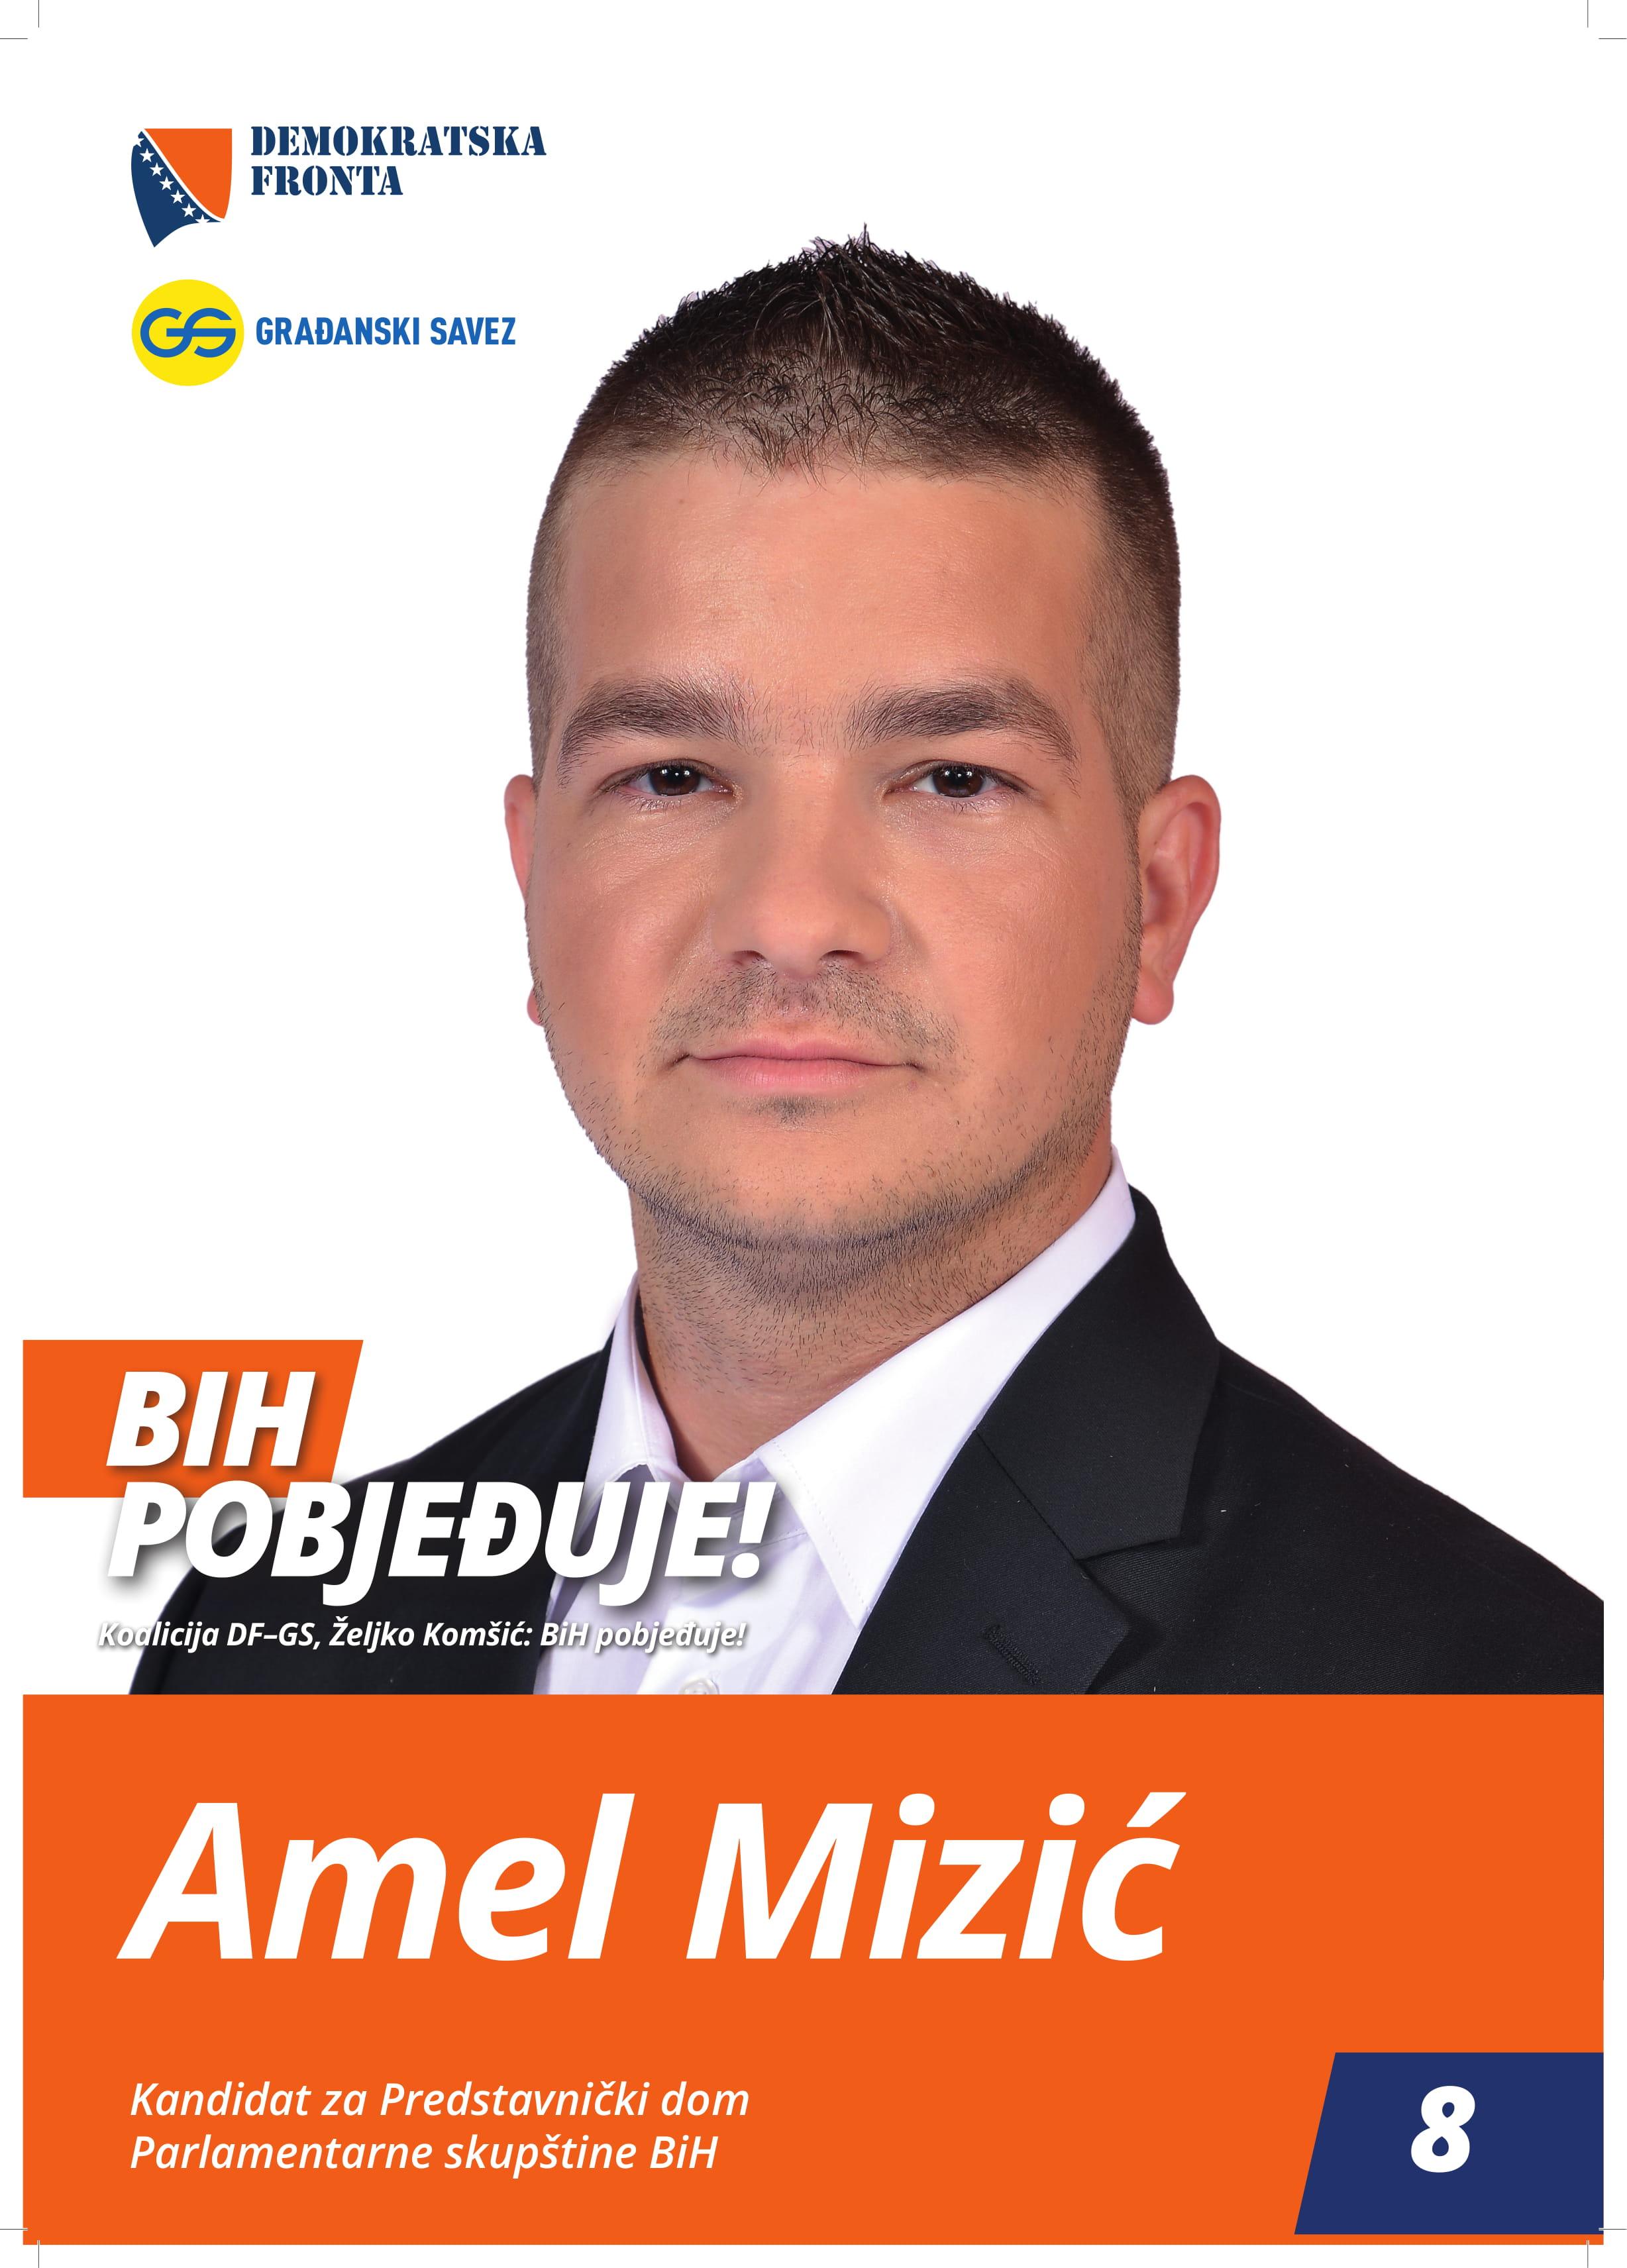 Amel Mizić, doktor medicine